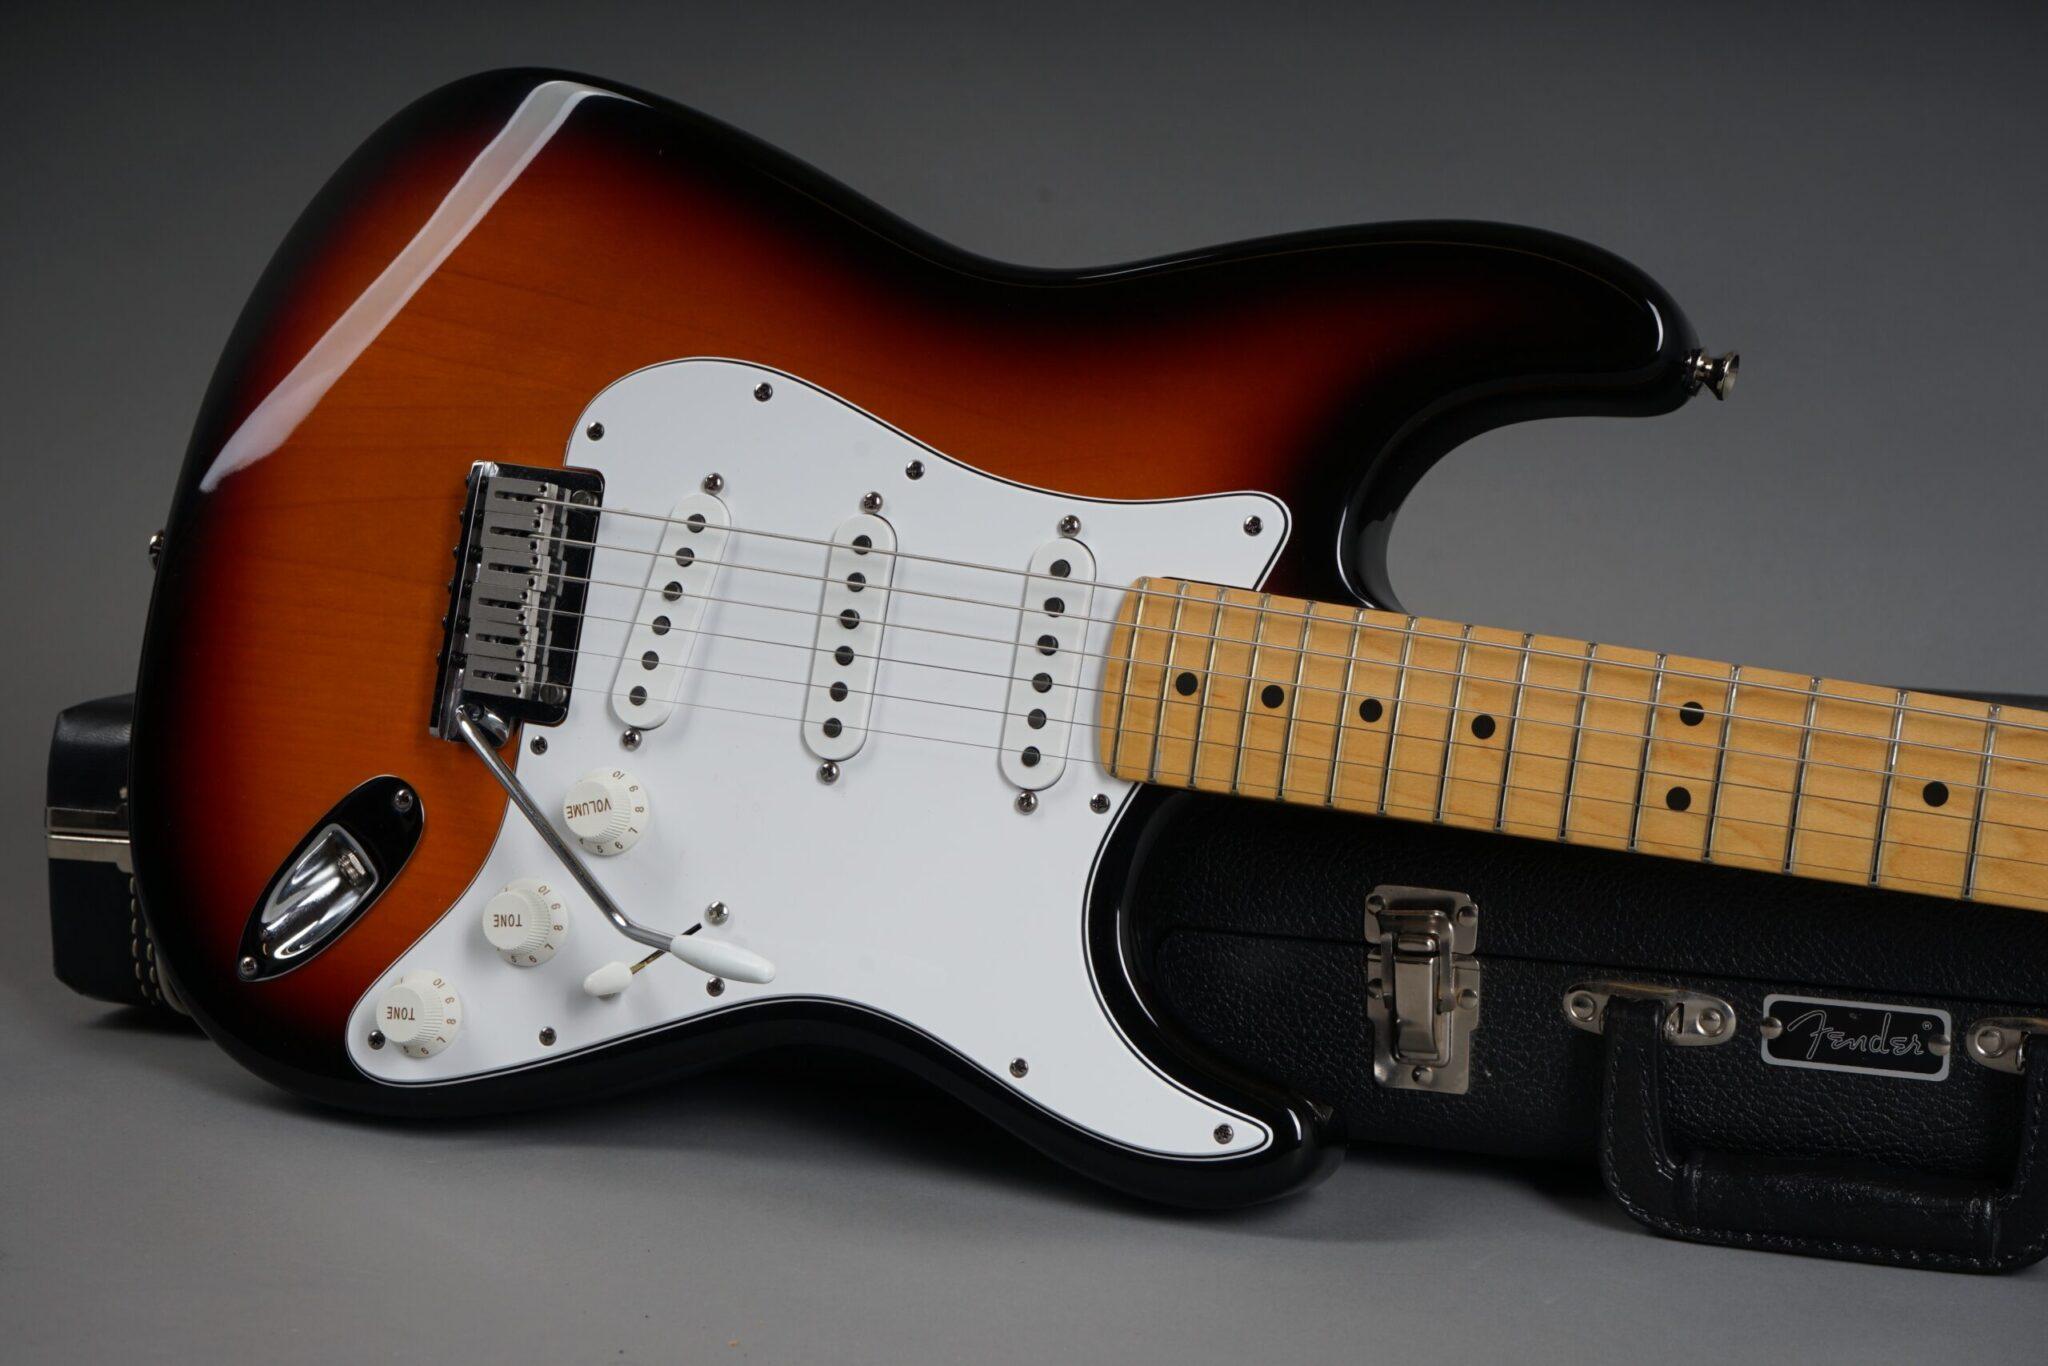 https://guitarpoint.de/app/uploads/products/1997-fender-american-standard-stratocaster-sunburst/1997-Fender-Standard-Stratocaster-3-tone-Sunburst-N7253113-19-scaled-2048x1366.jpg